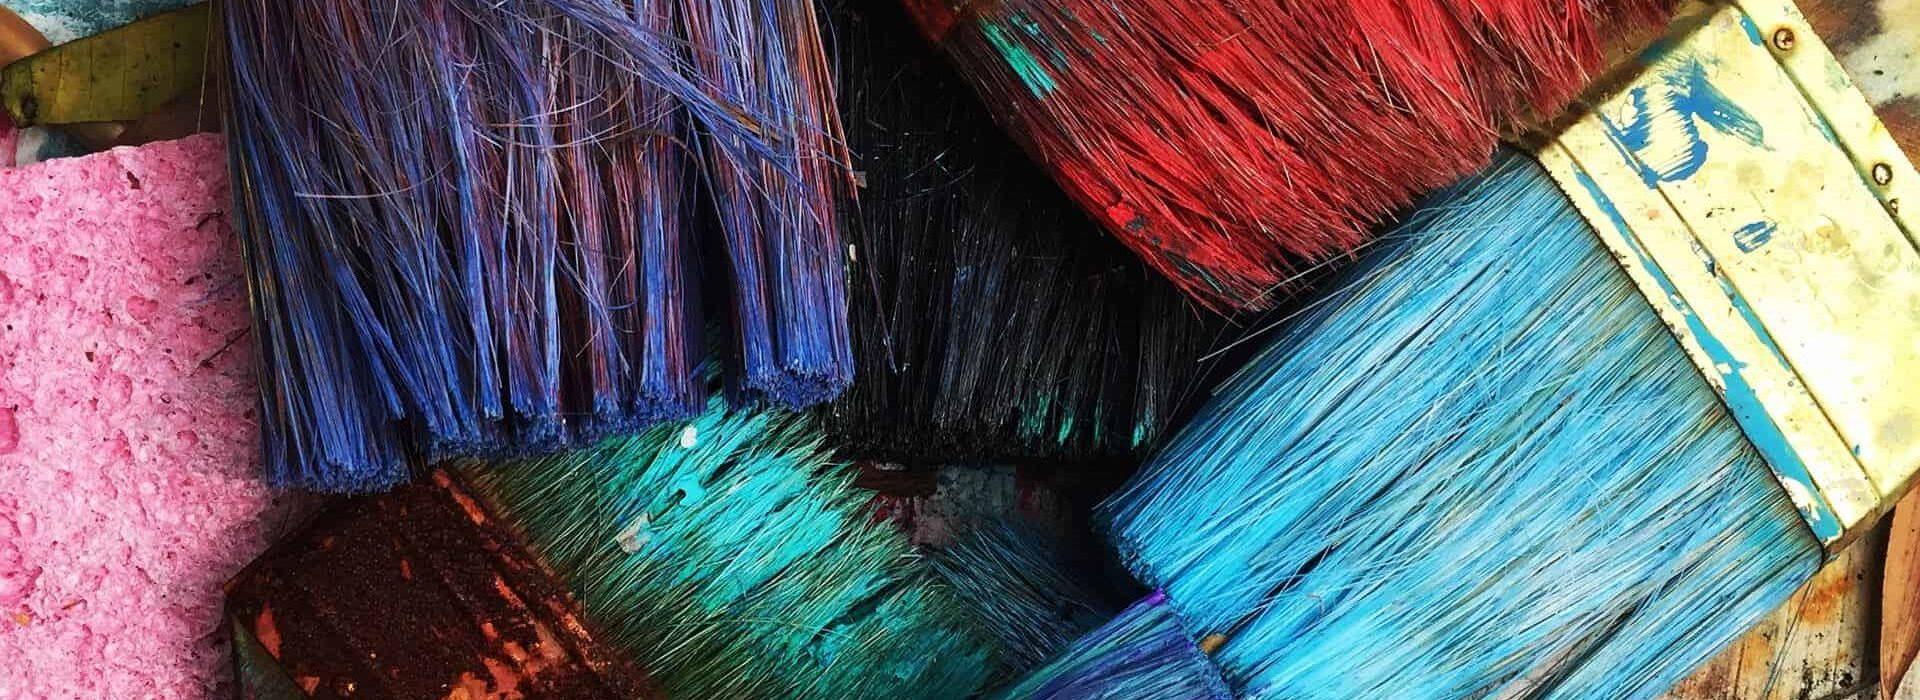 rhondak-native-florida-folk-artist-83553-unsplash